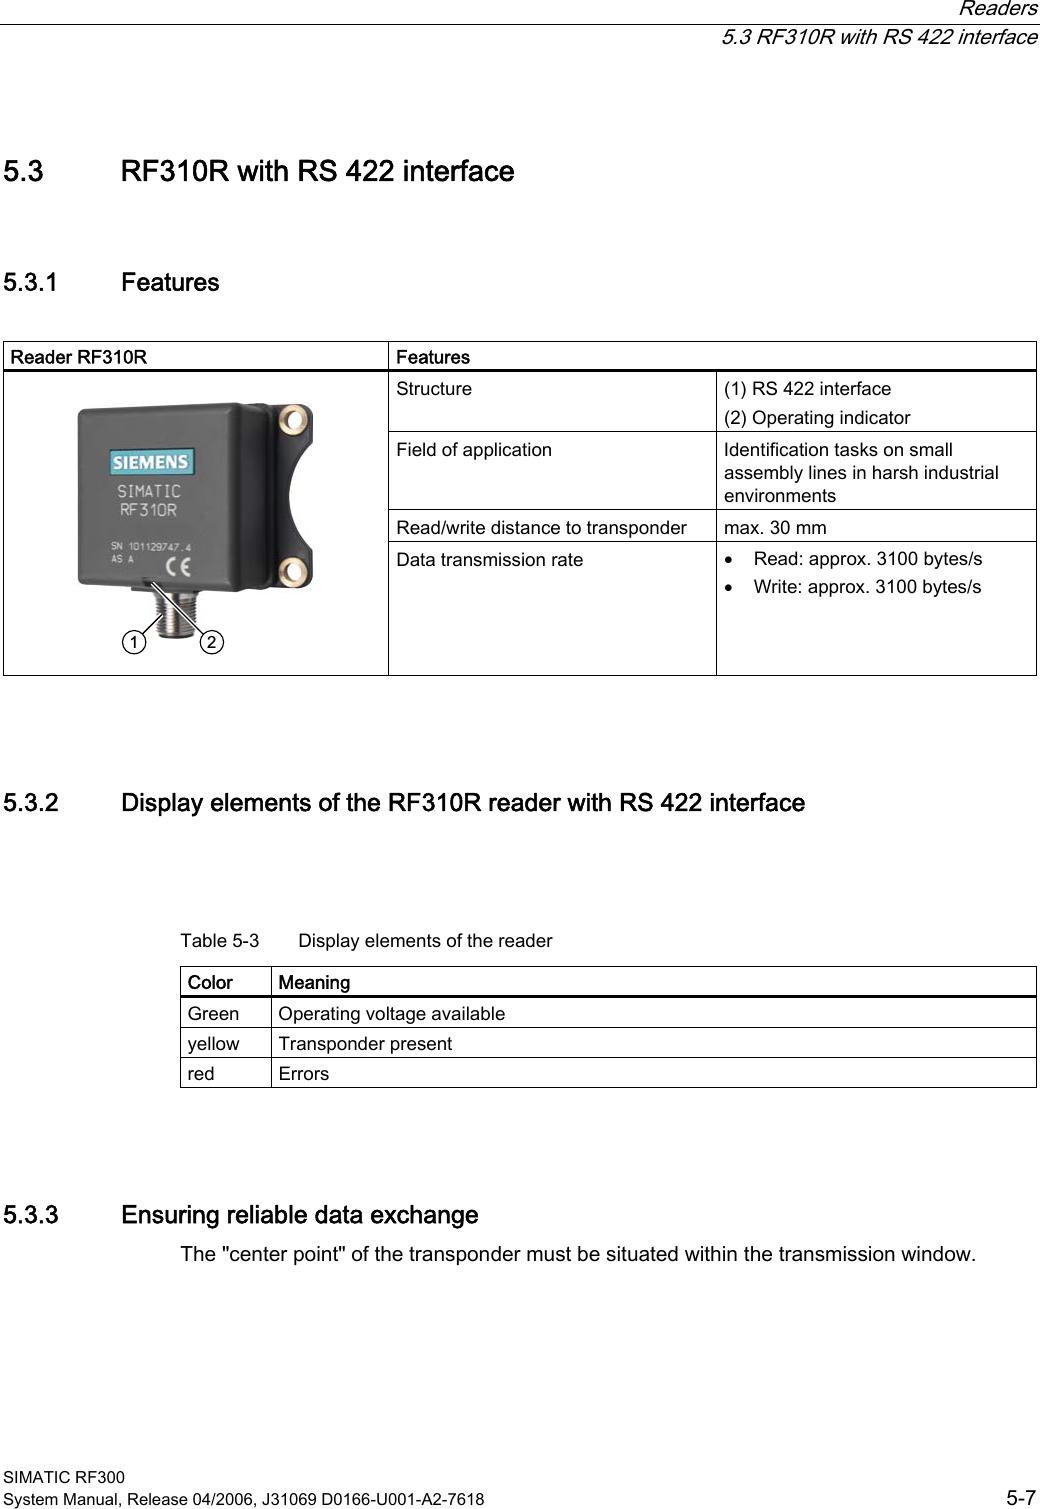 siemens v20 drive manual pdf